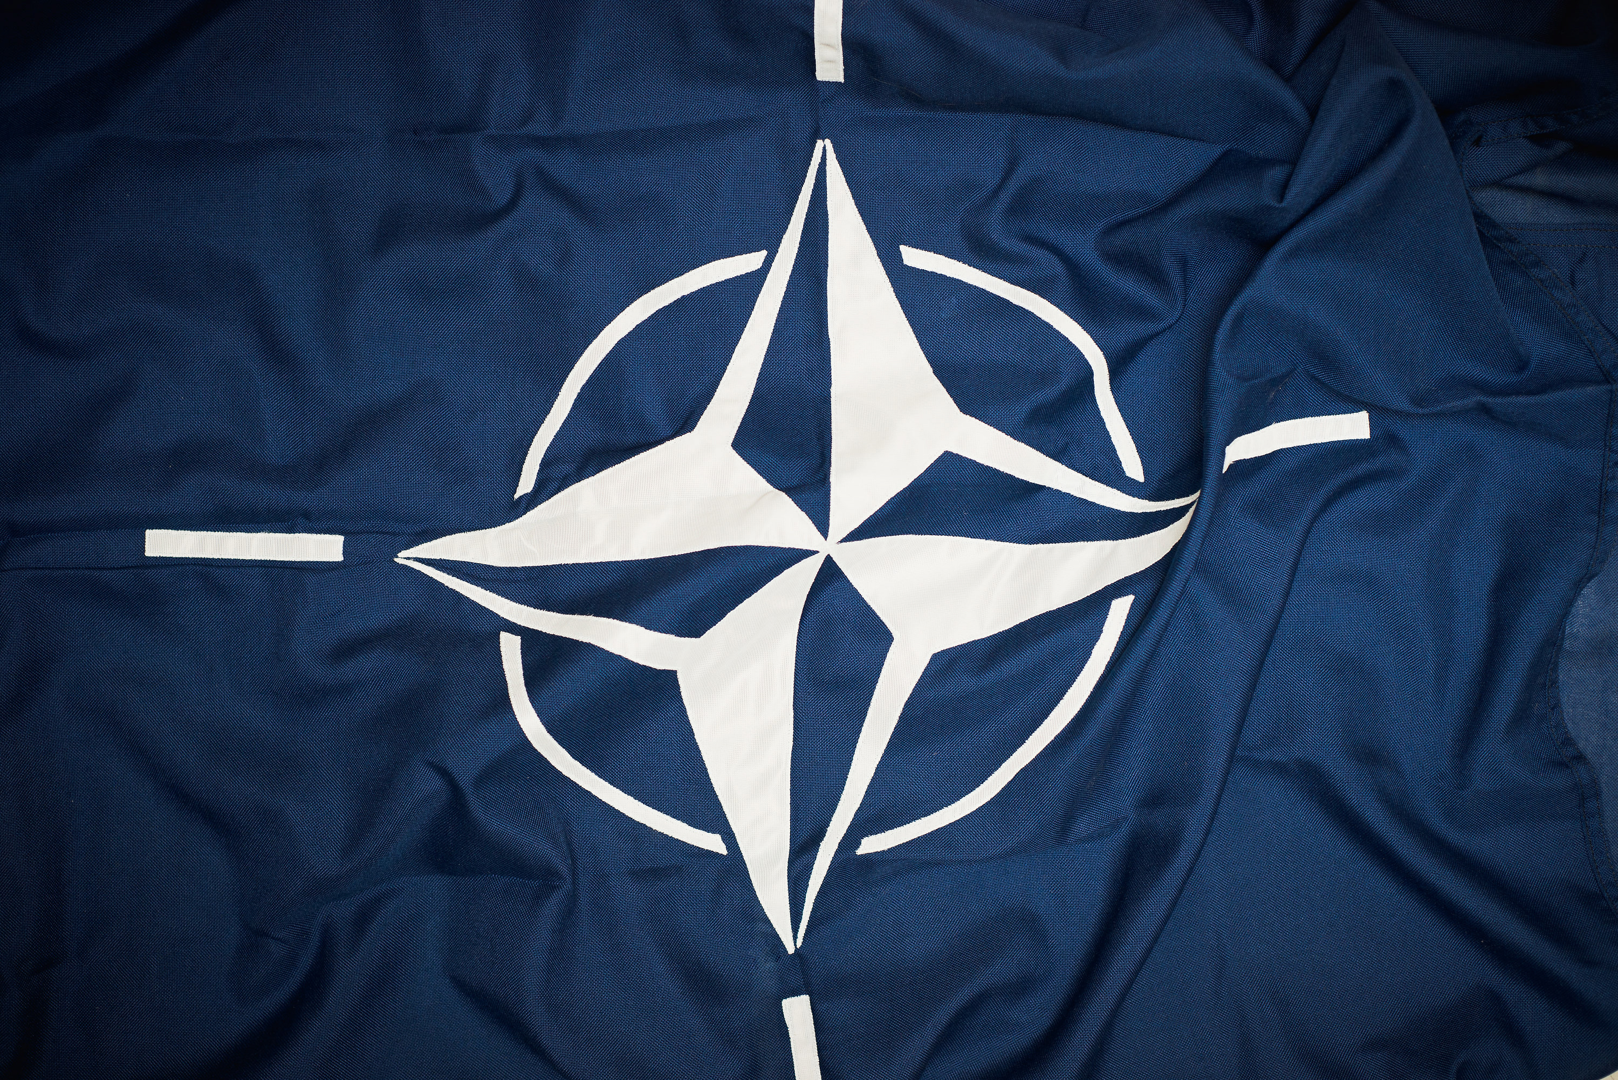 NATO, sprijinit la Marea Baltică